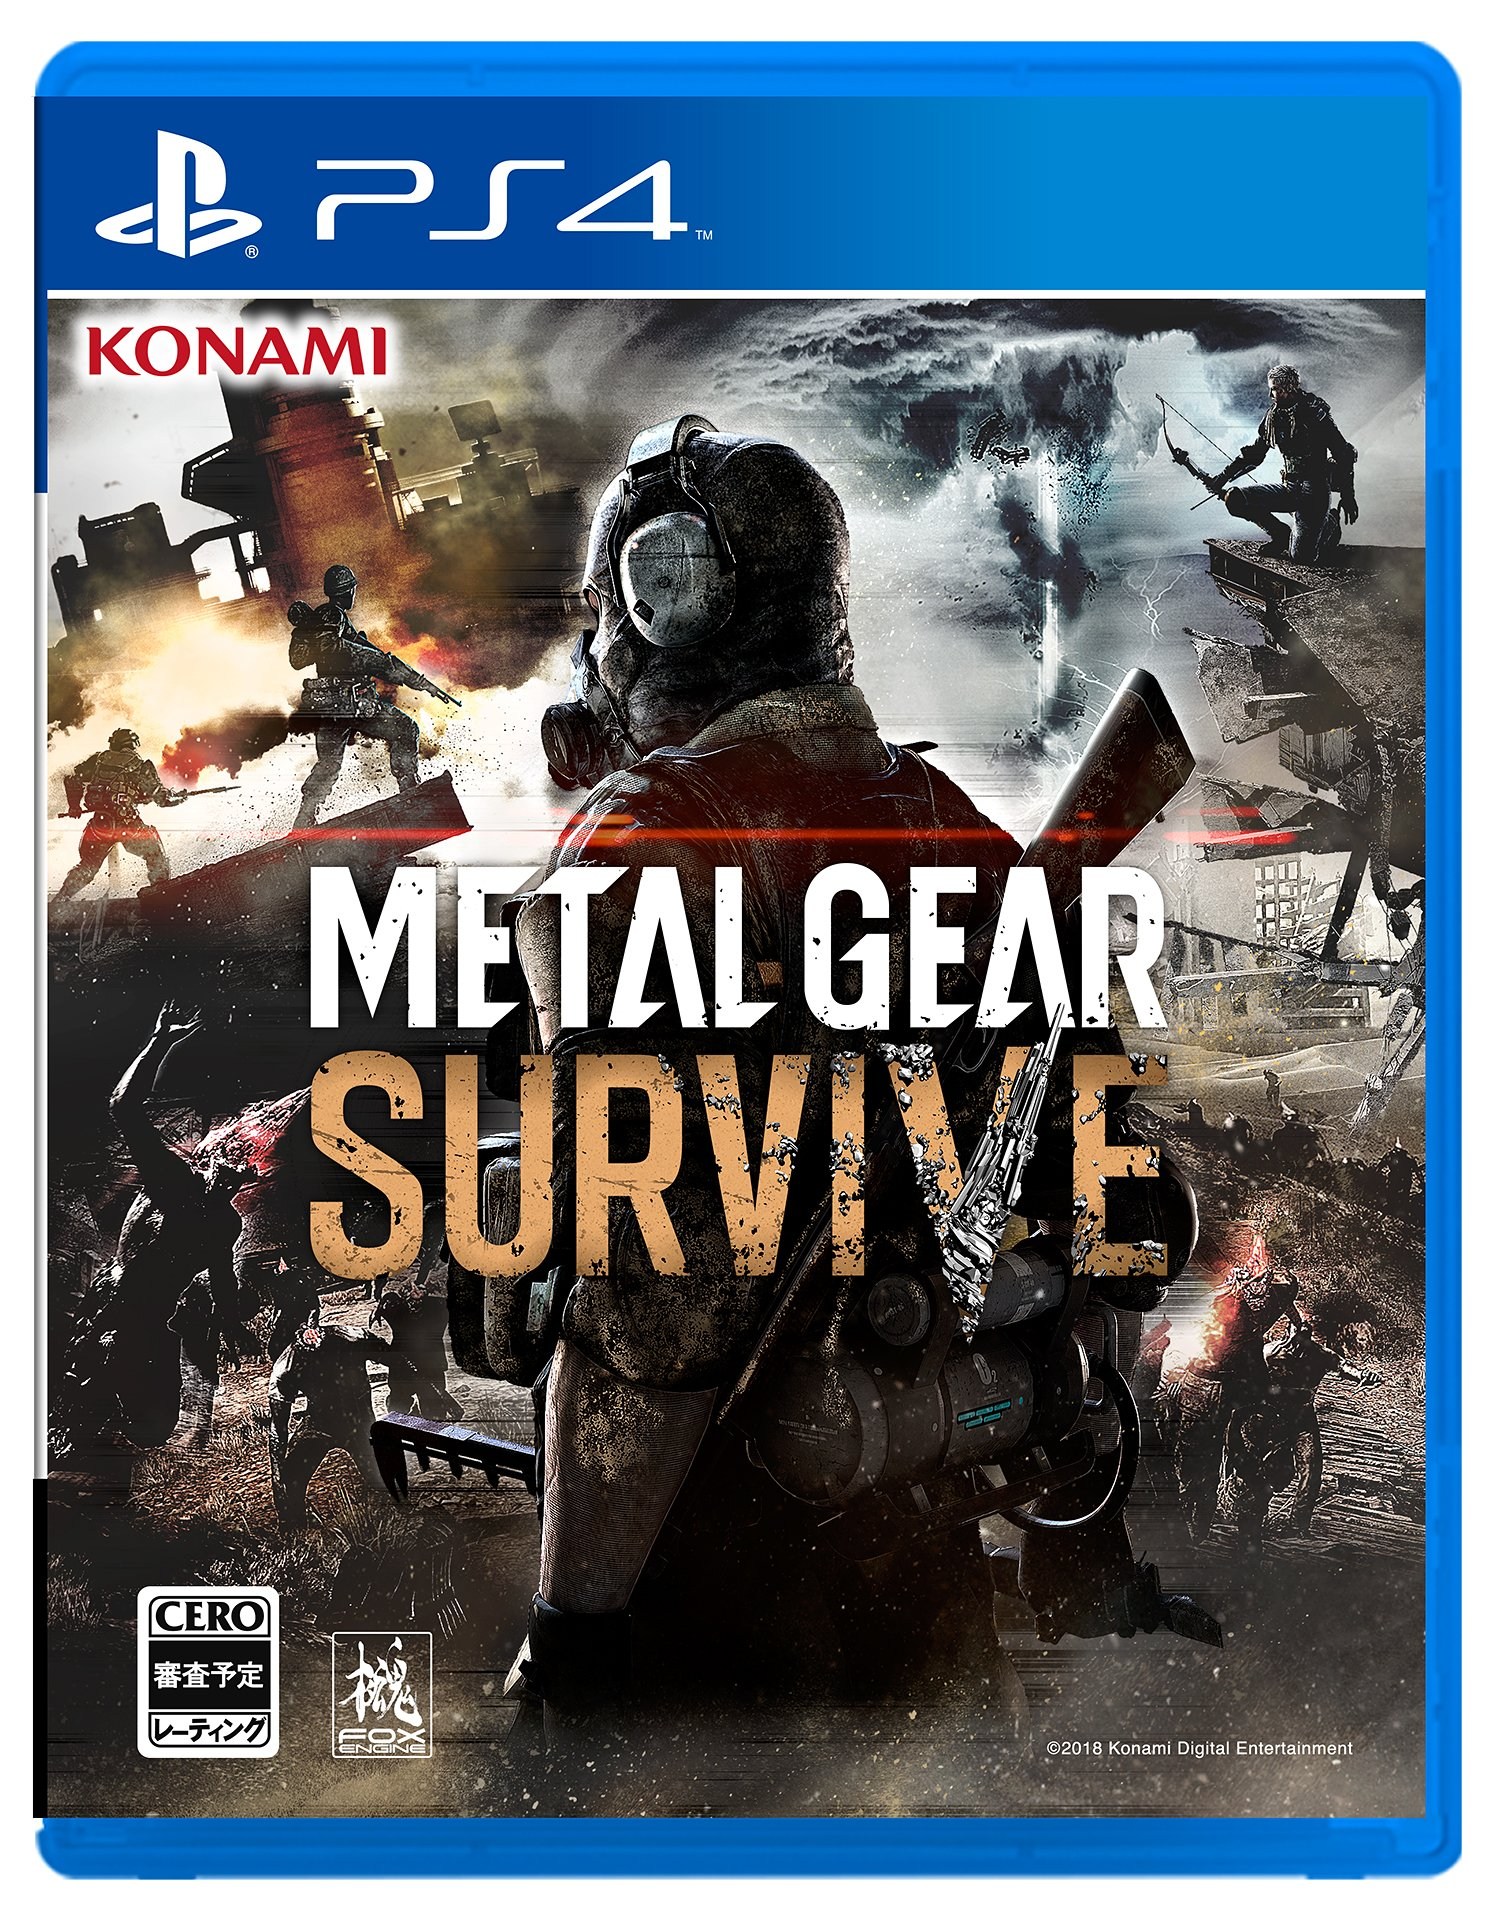 METAL GEAR SURVIVE 【Amazon限定特典】DLC「ゴールドハンマーパック」(配信) 付